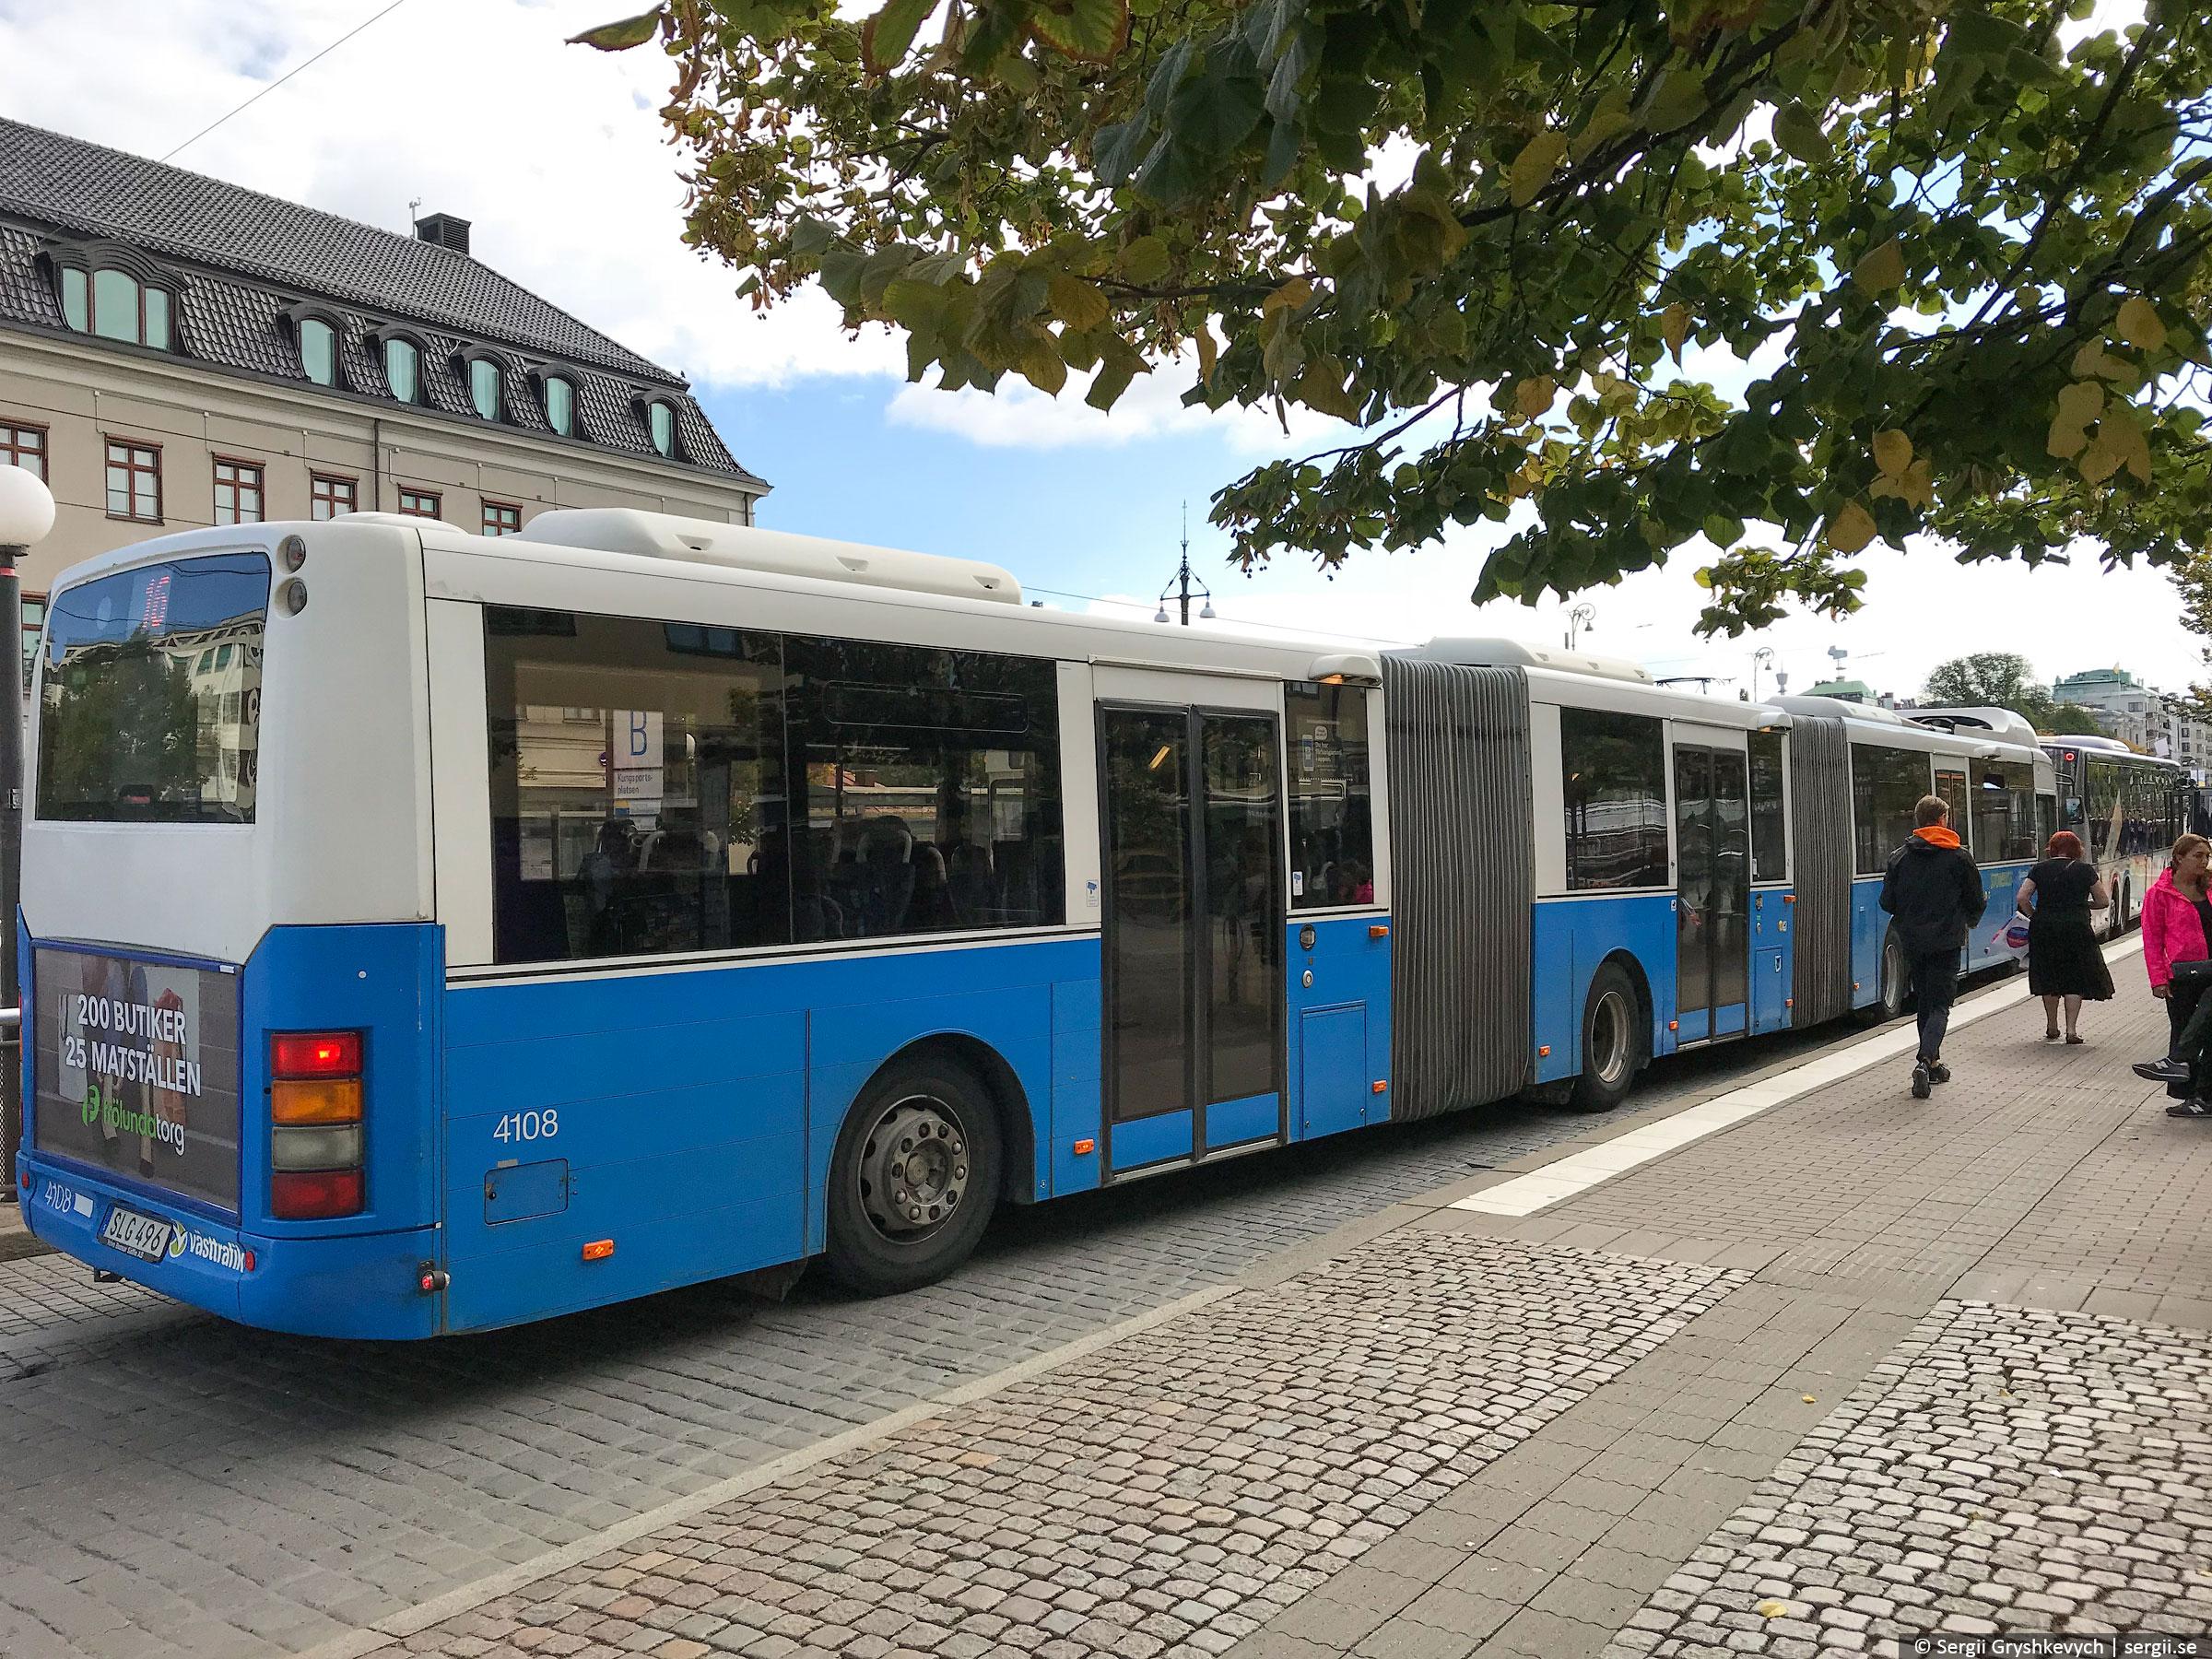 göteborg-ghotenburg-sweden-2018-13